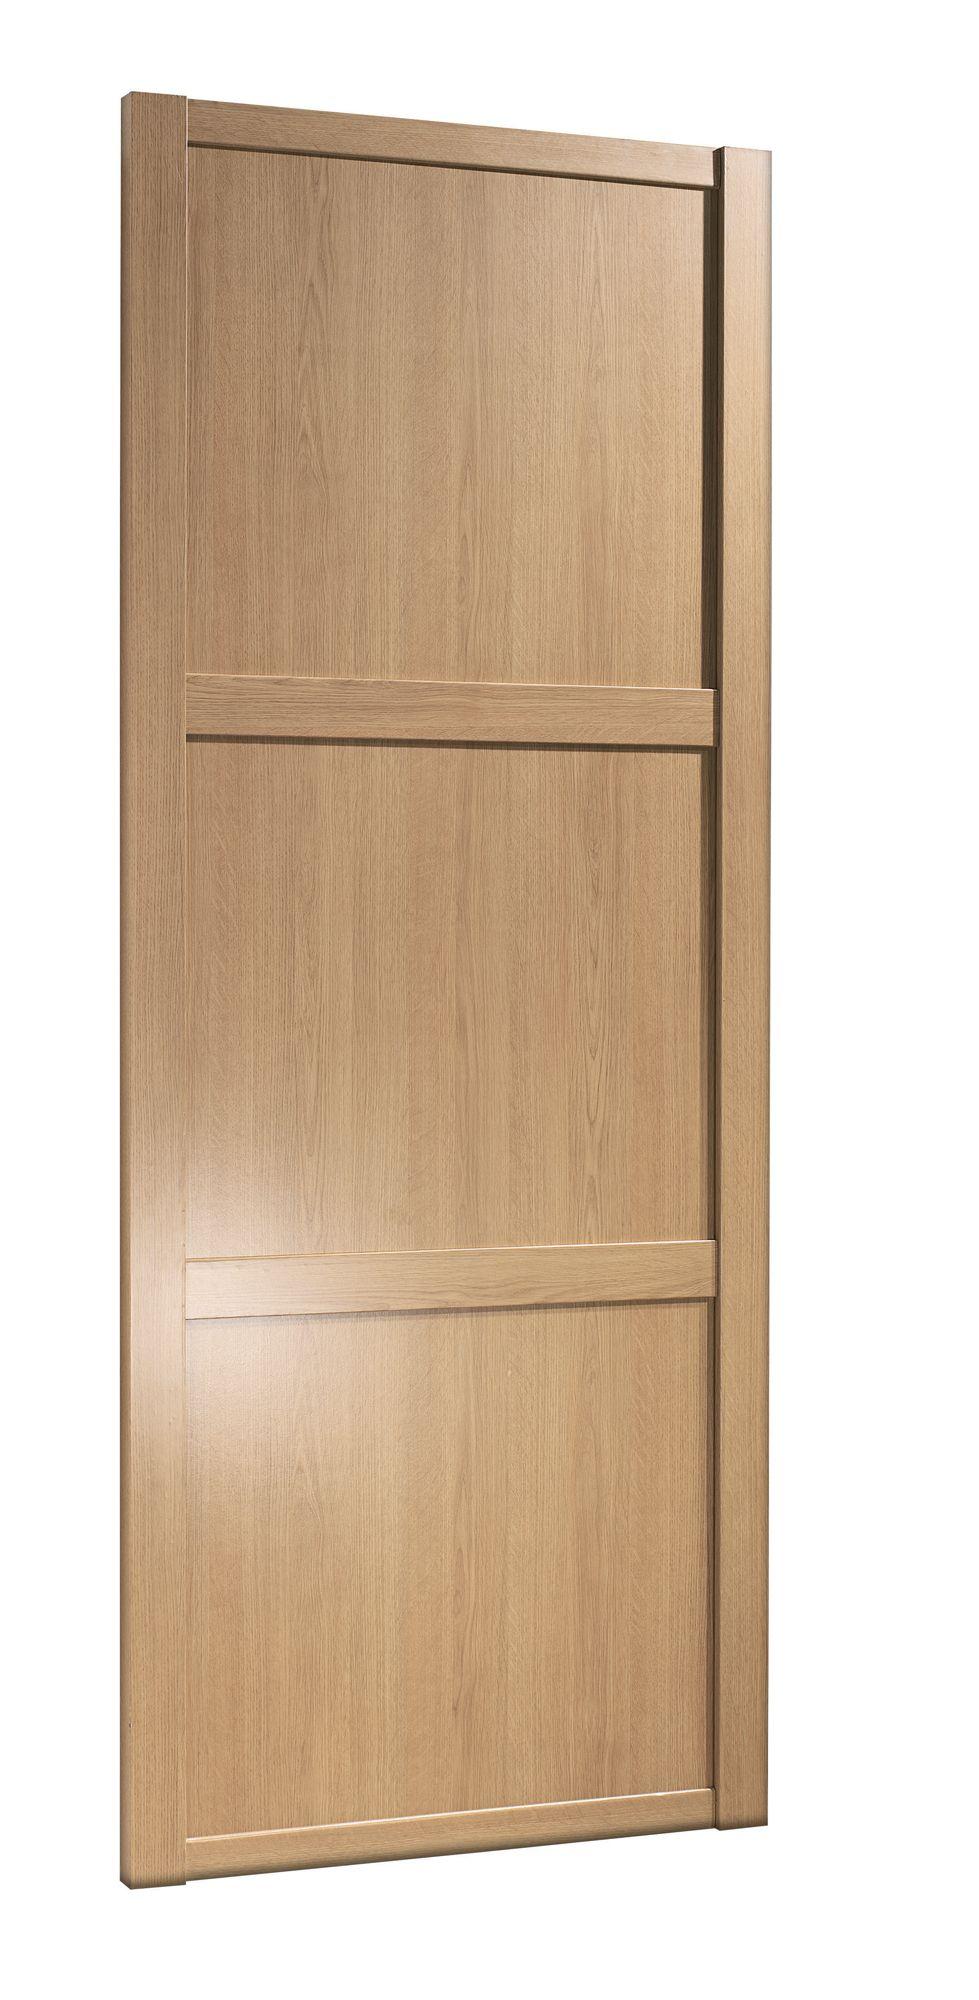 Shaker natural oak effect sliding wardrobe door h 2220 mm for B q bedrooms sliding wardrobe doors